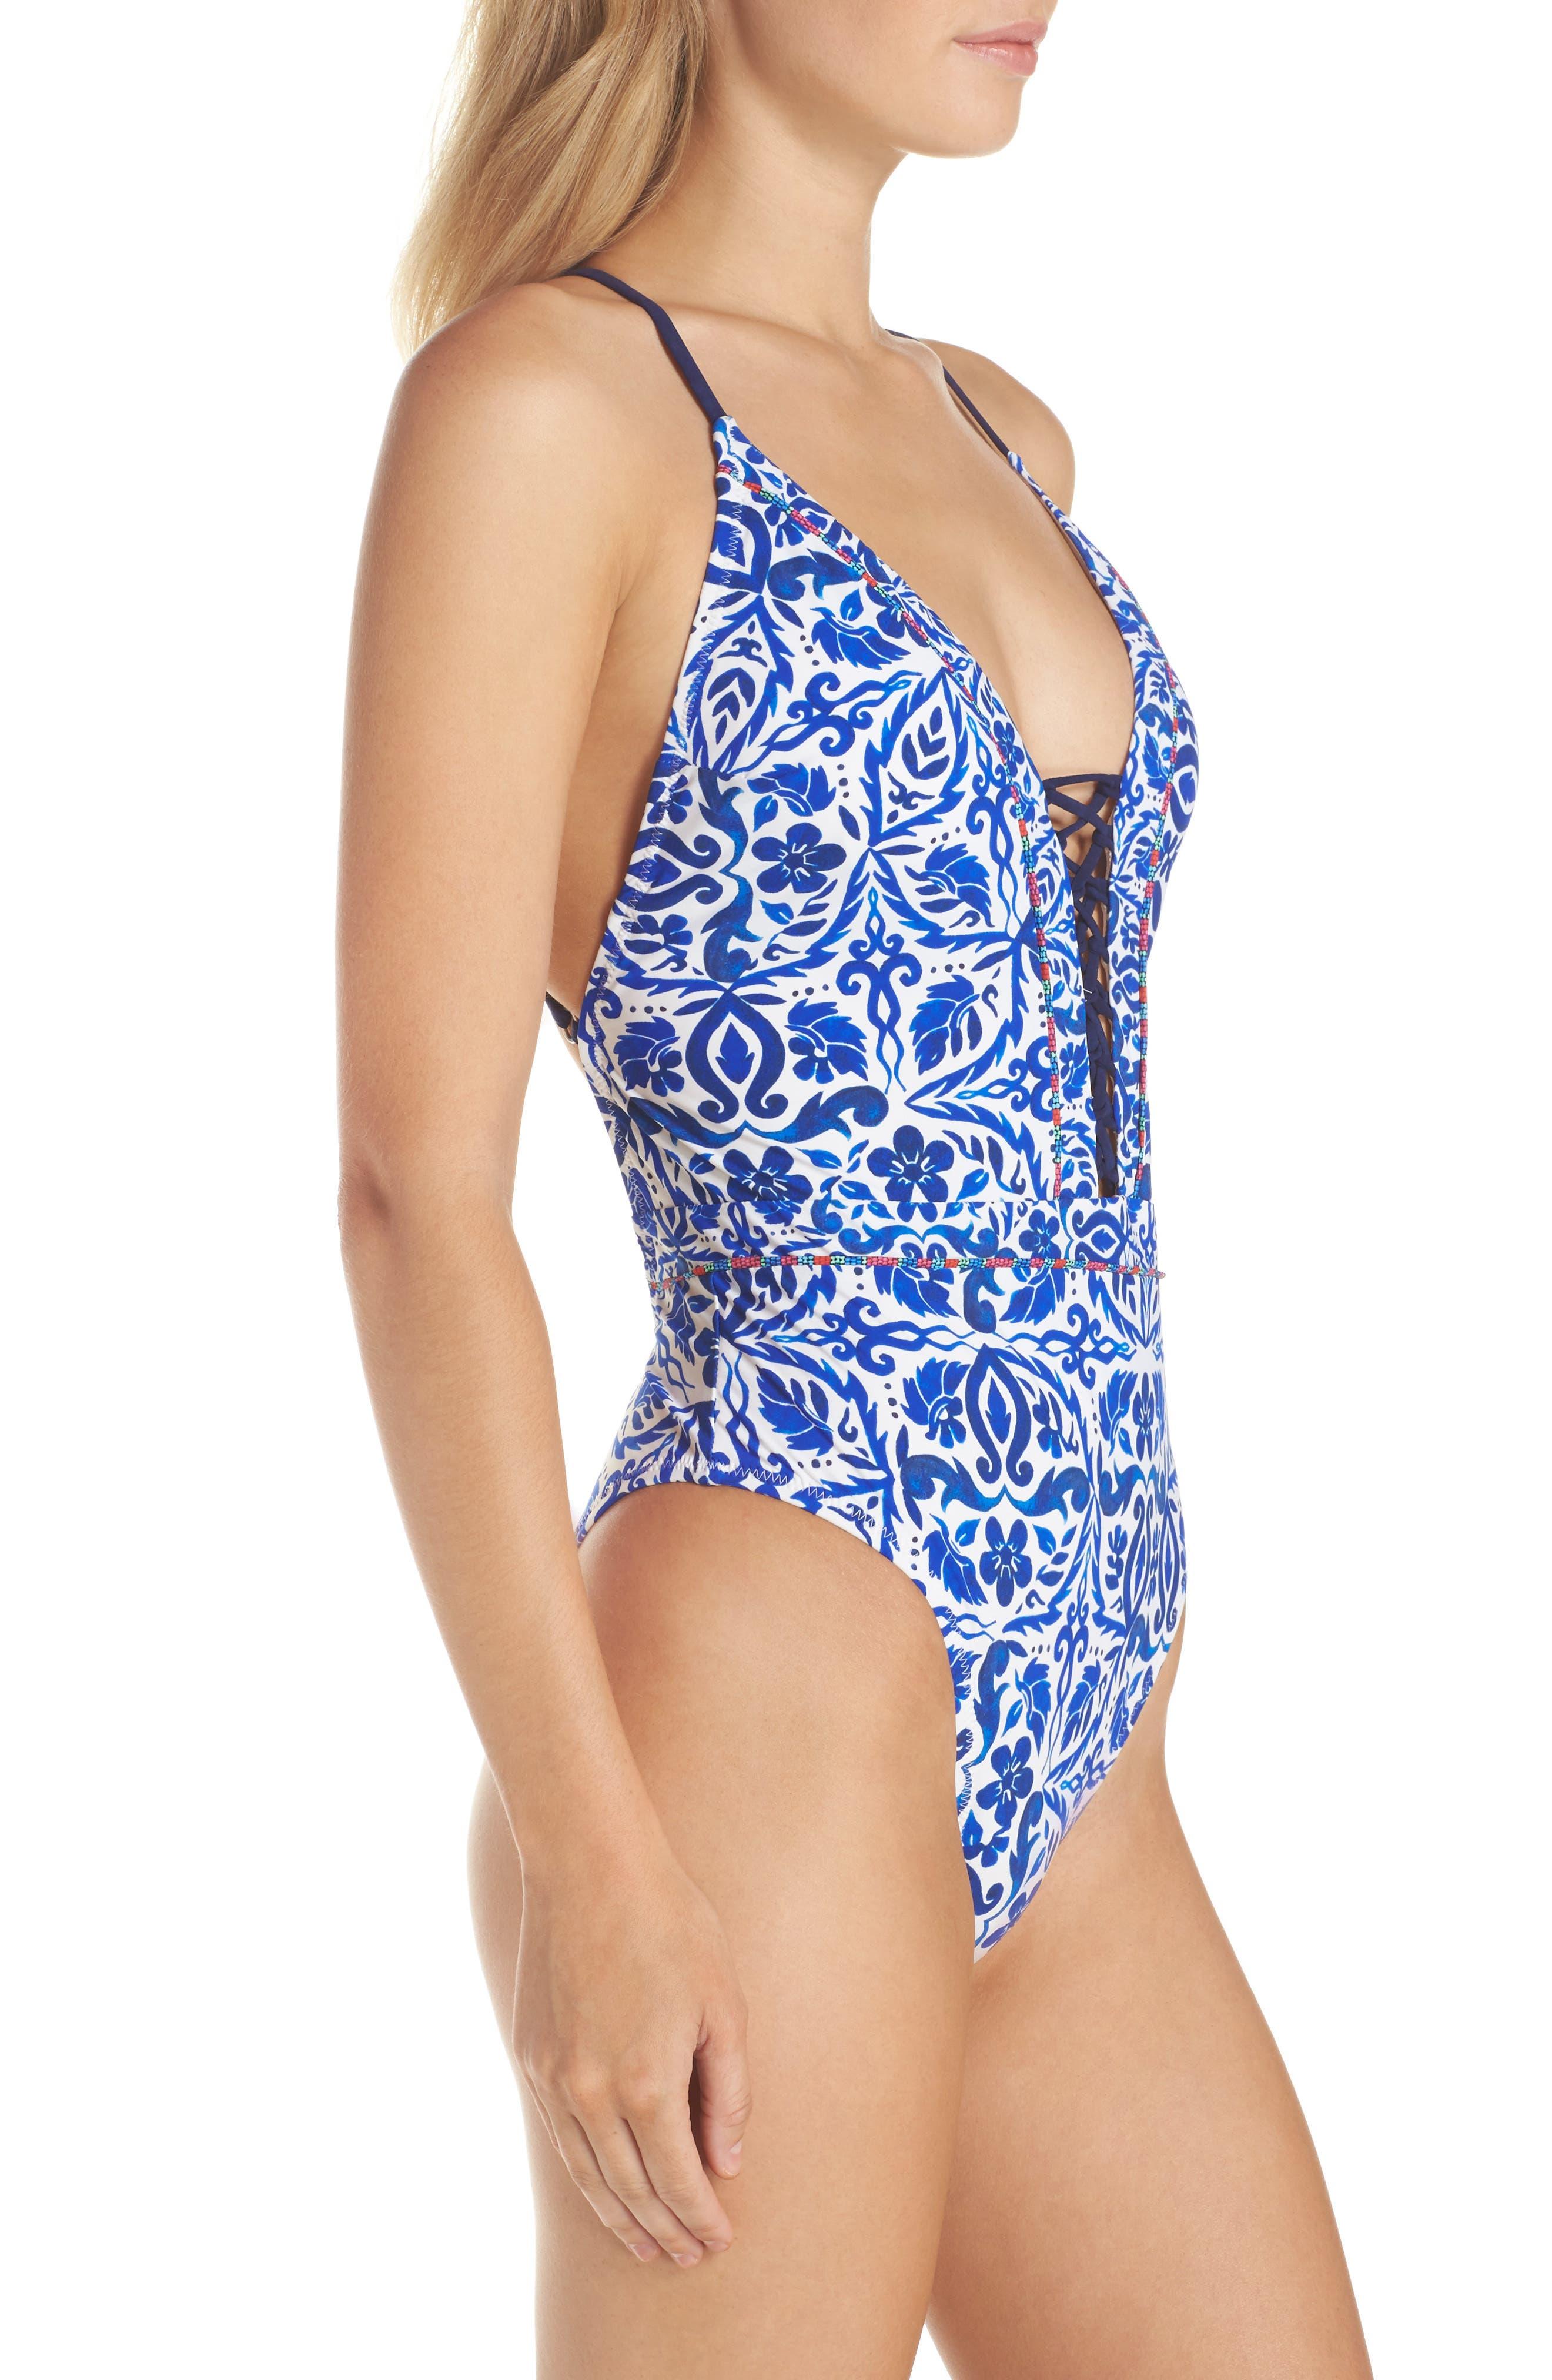 Talavera Goddess One-Piece Swimsuit,                             Alternate thumbnail 3, color,